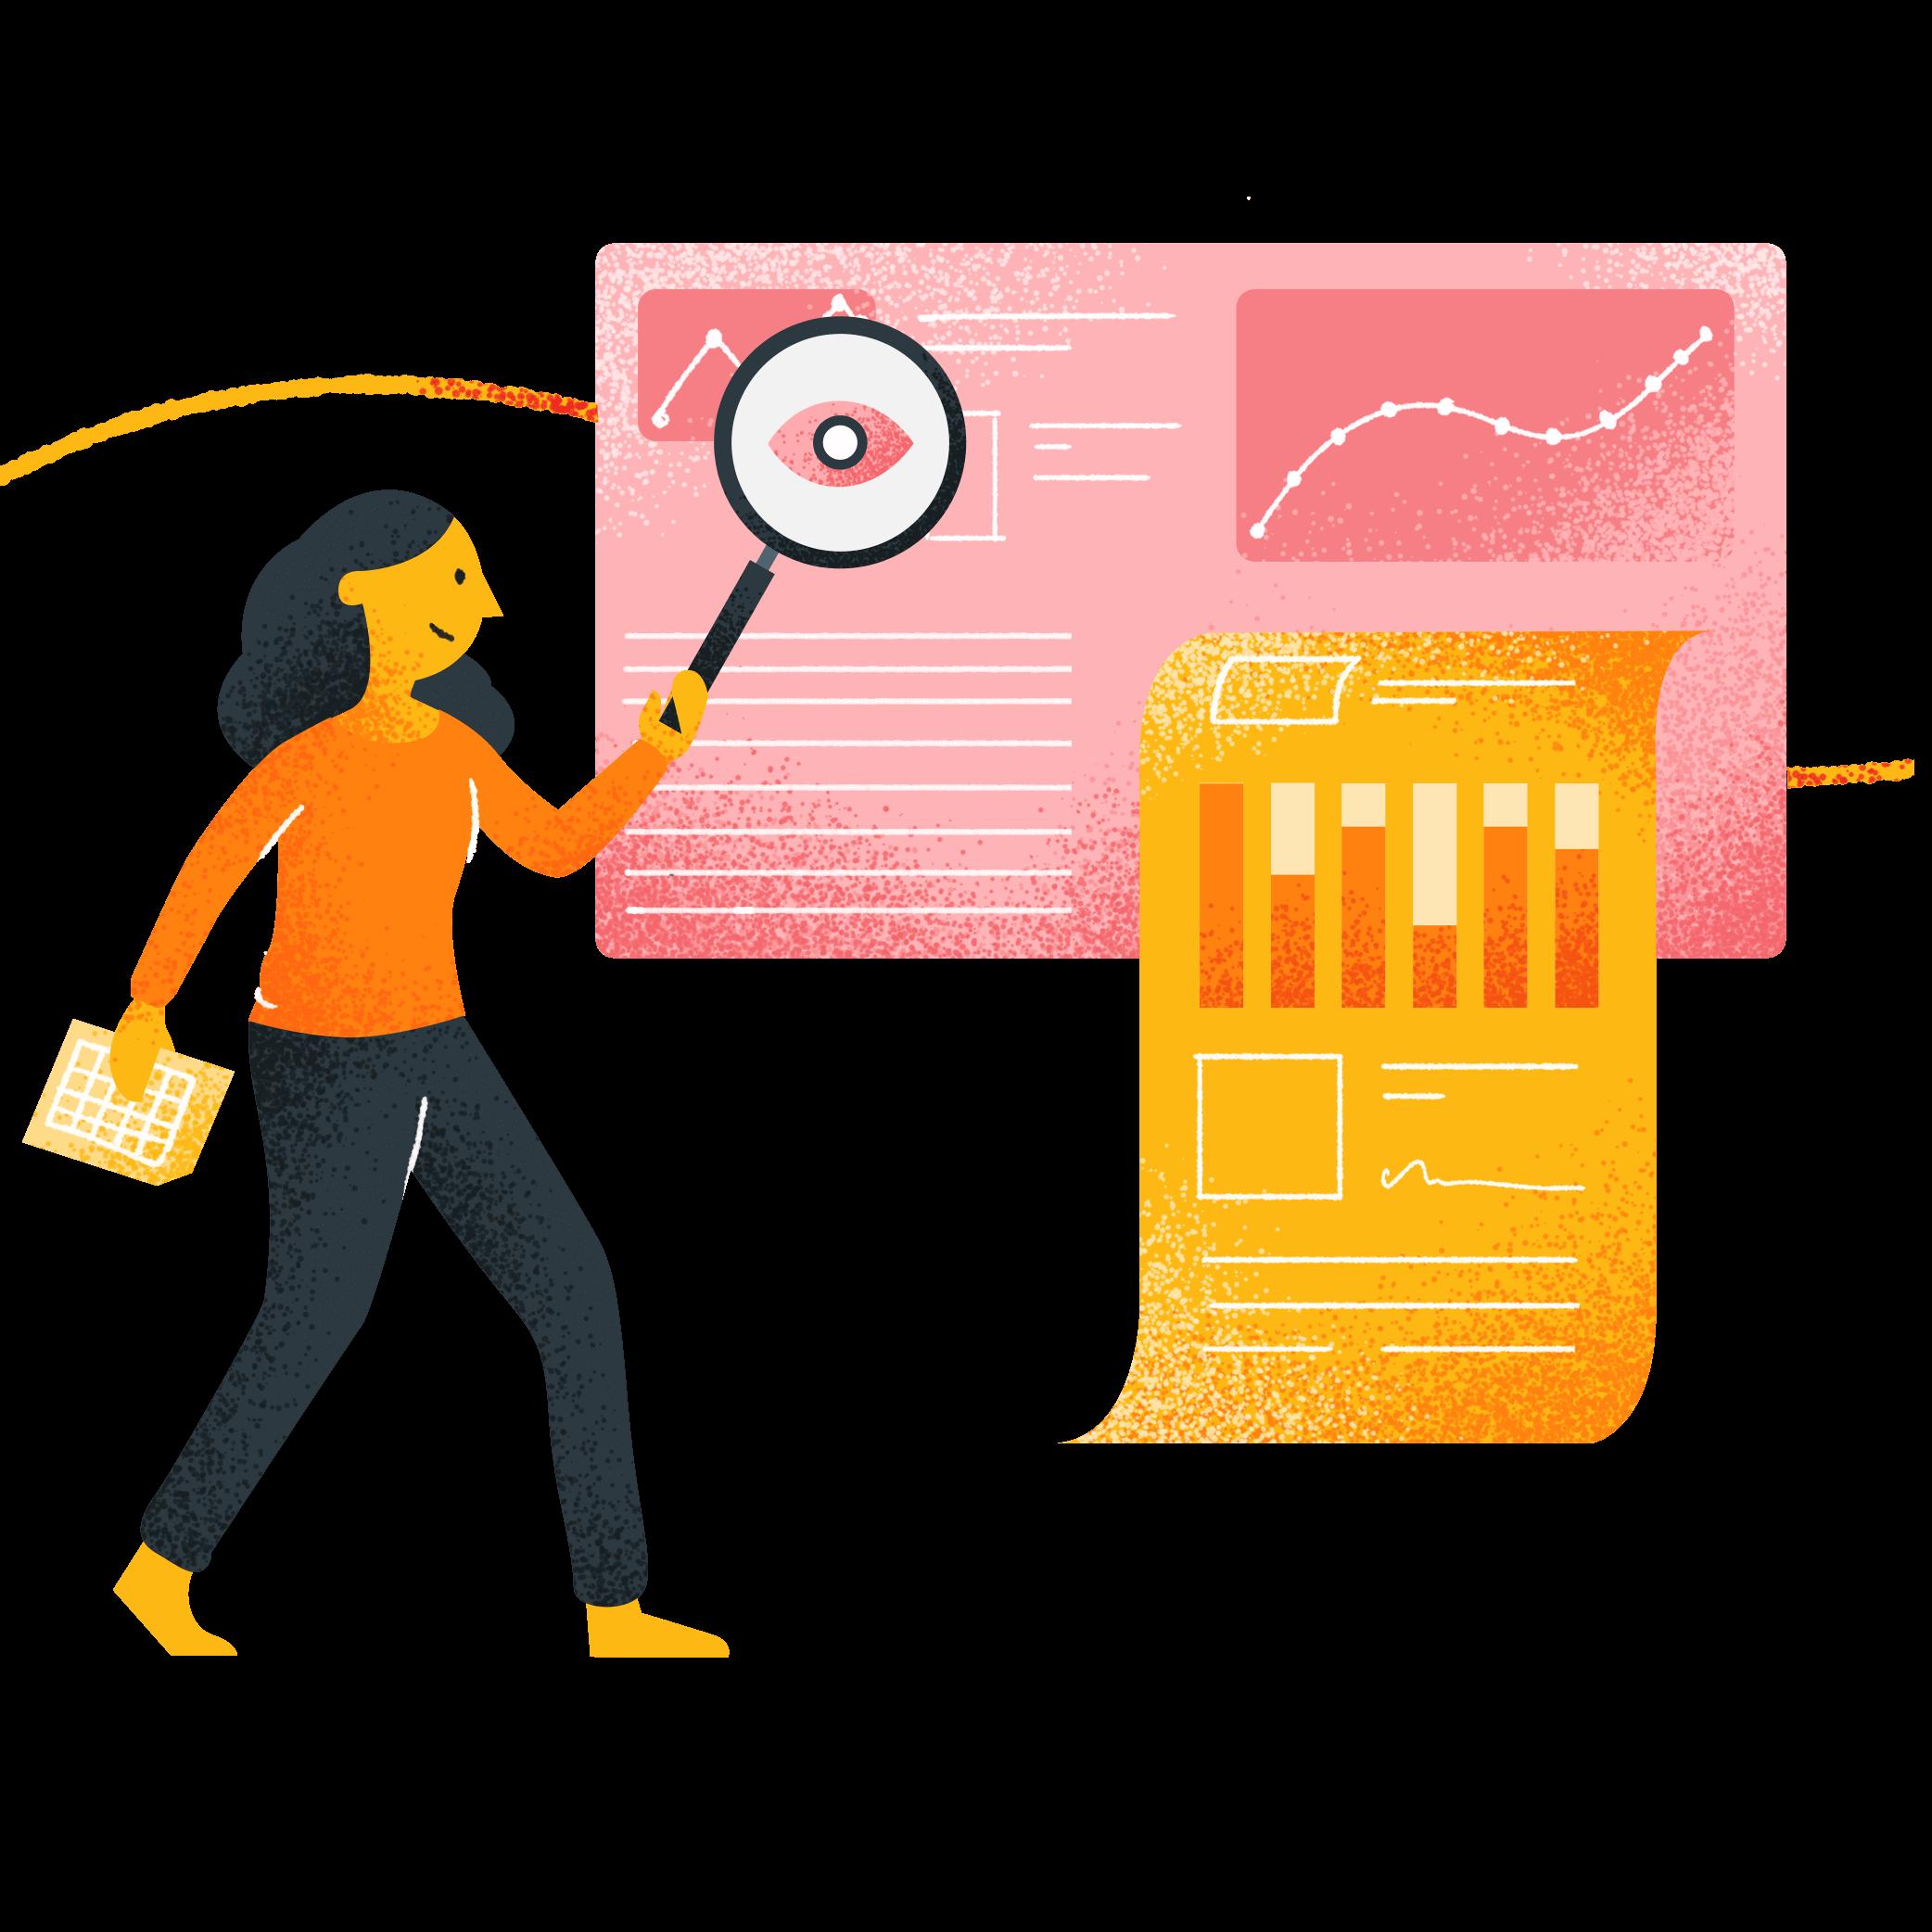 Phrazor-features-data-analysis-reporting-platform